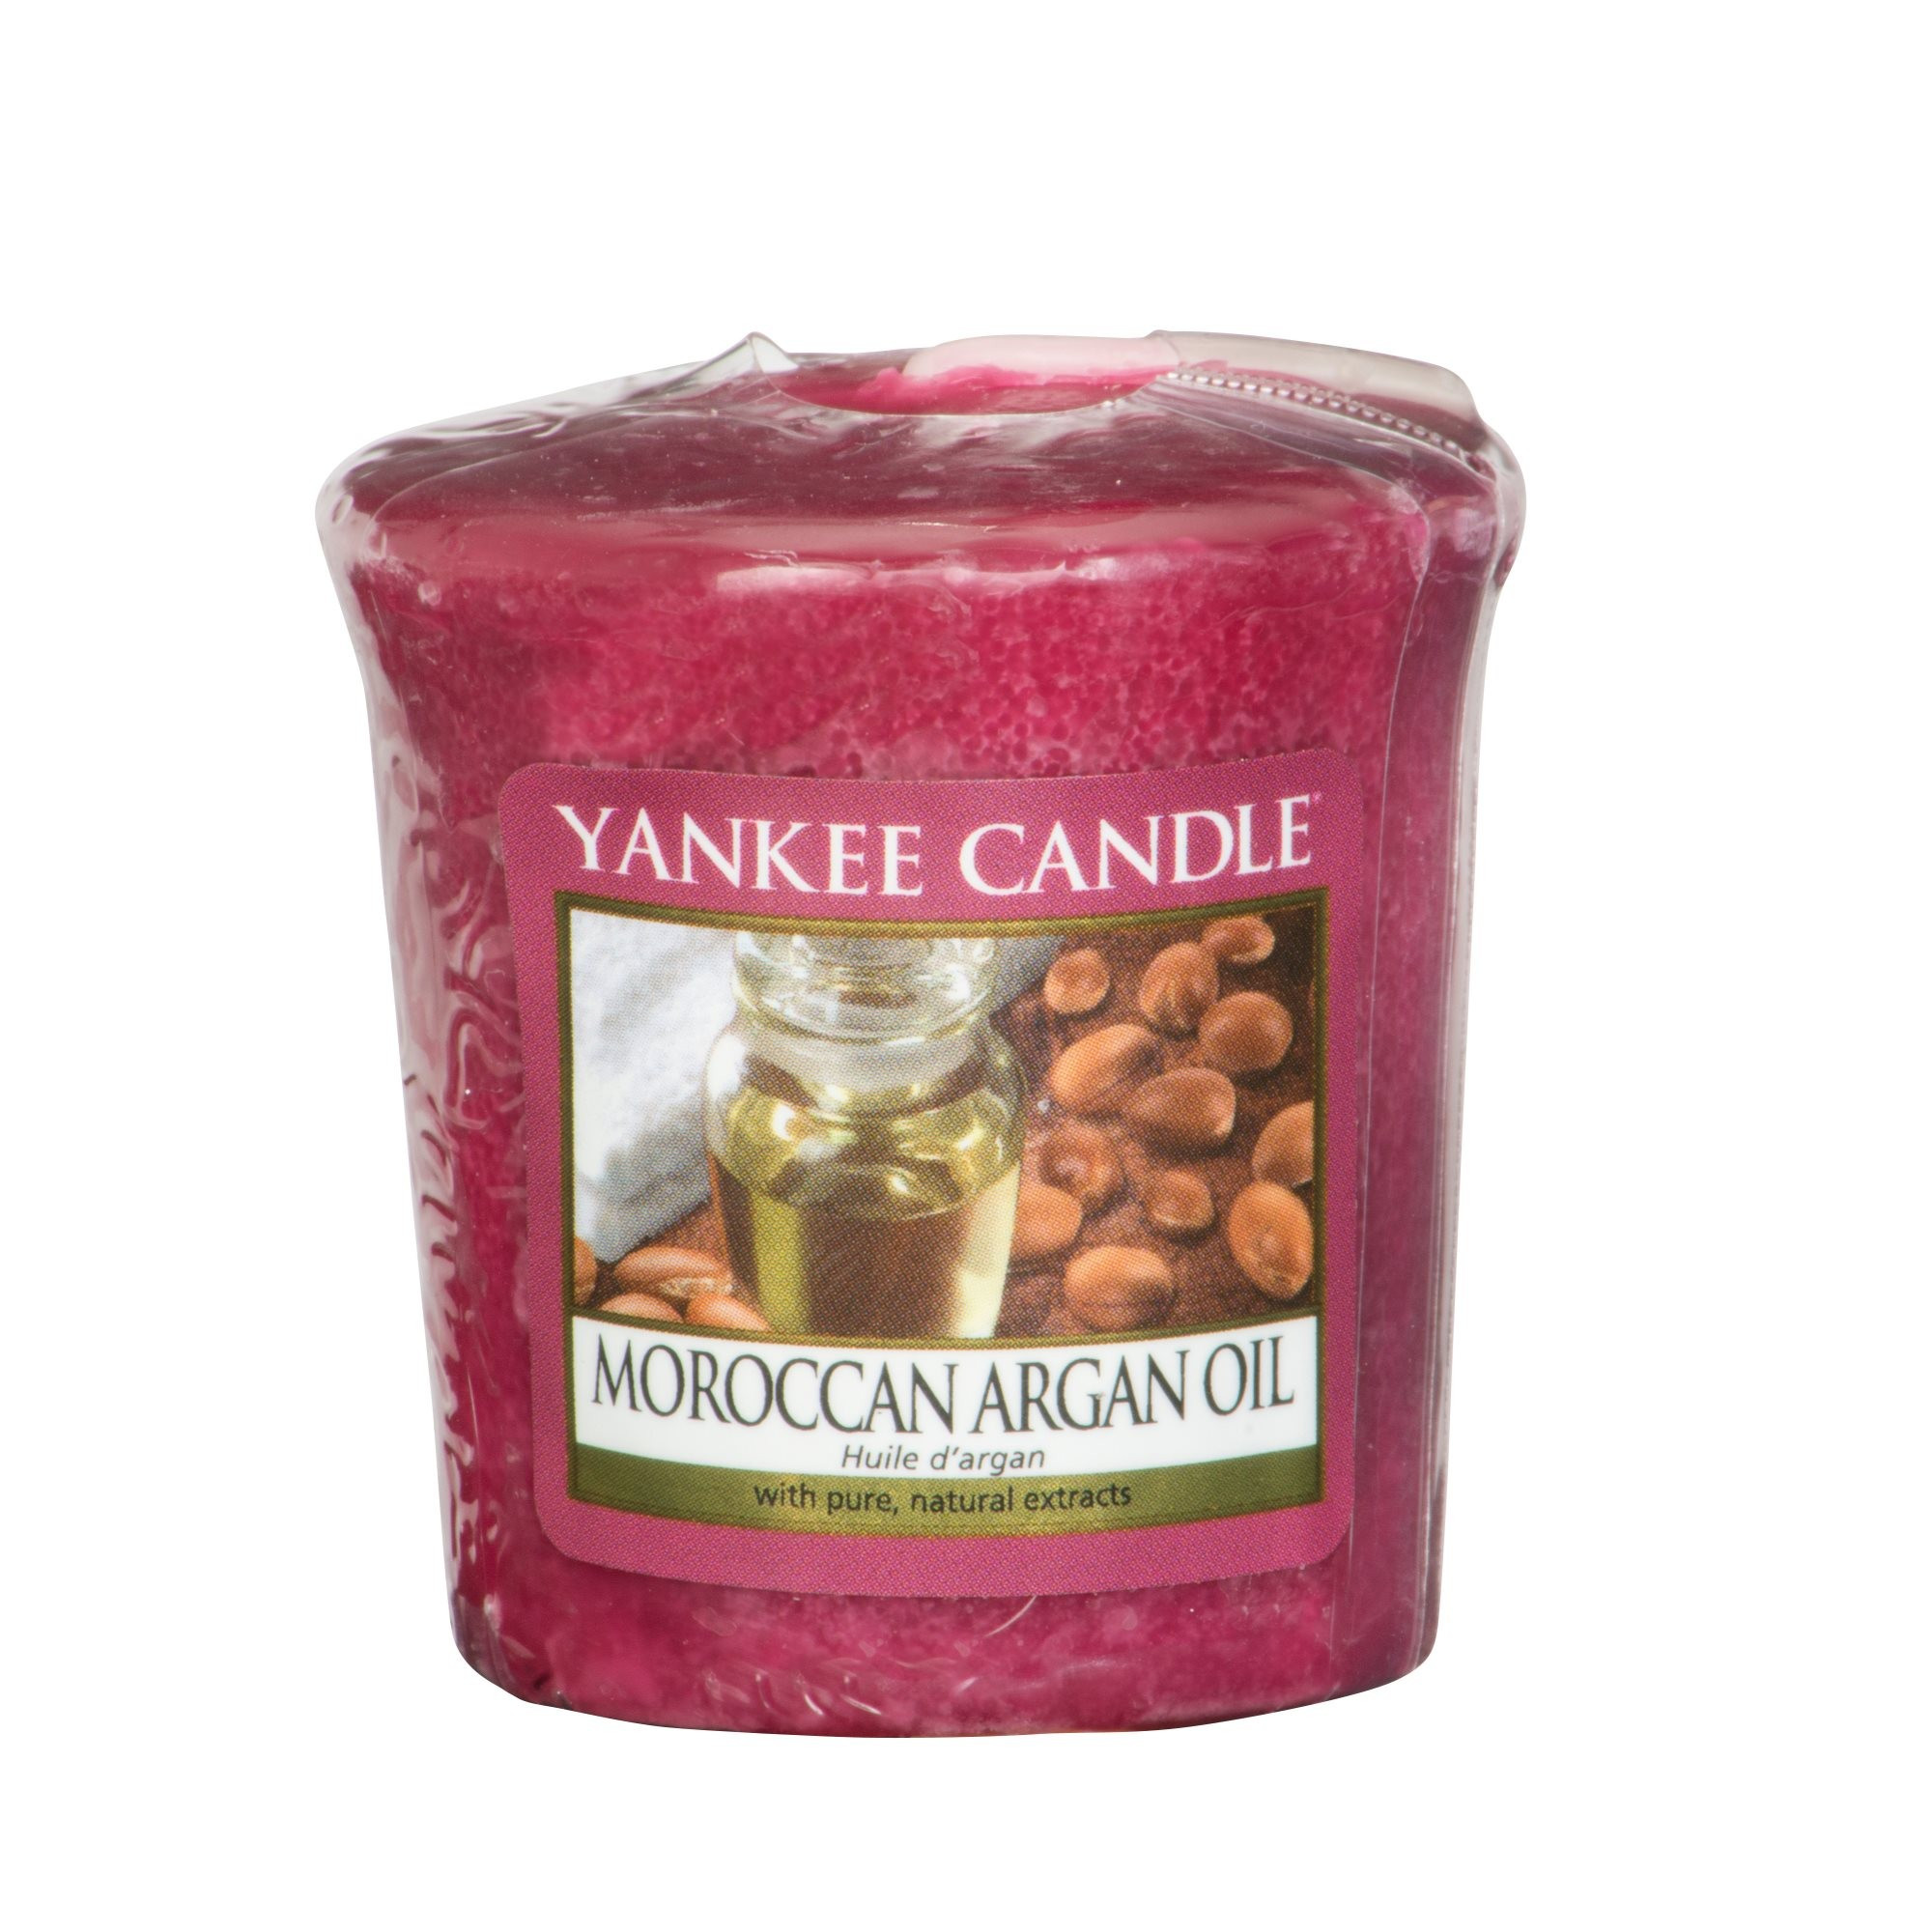 Žvakelė YANKEE CANDLE Moroccan Argan Oil Candle 49 g, 1 vnt.